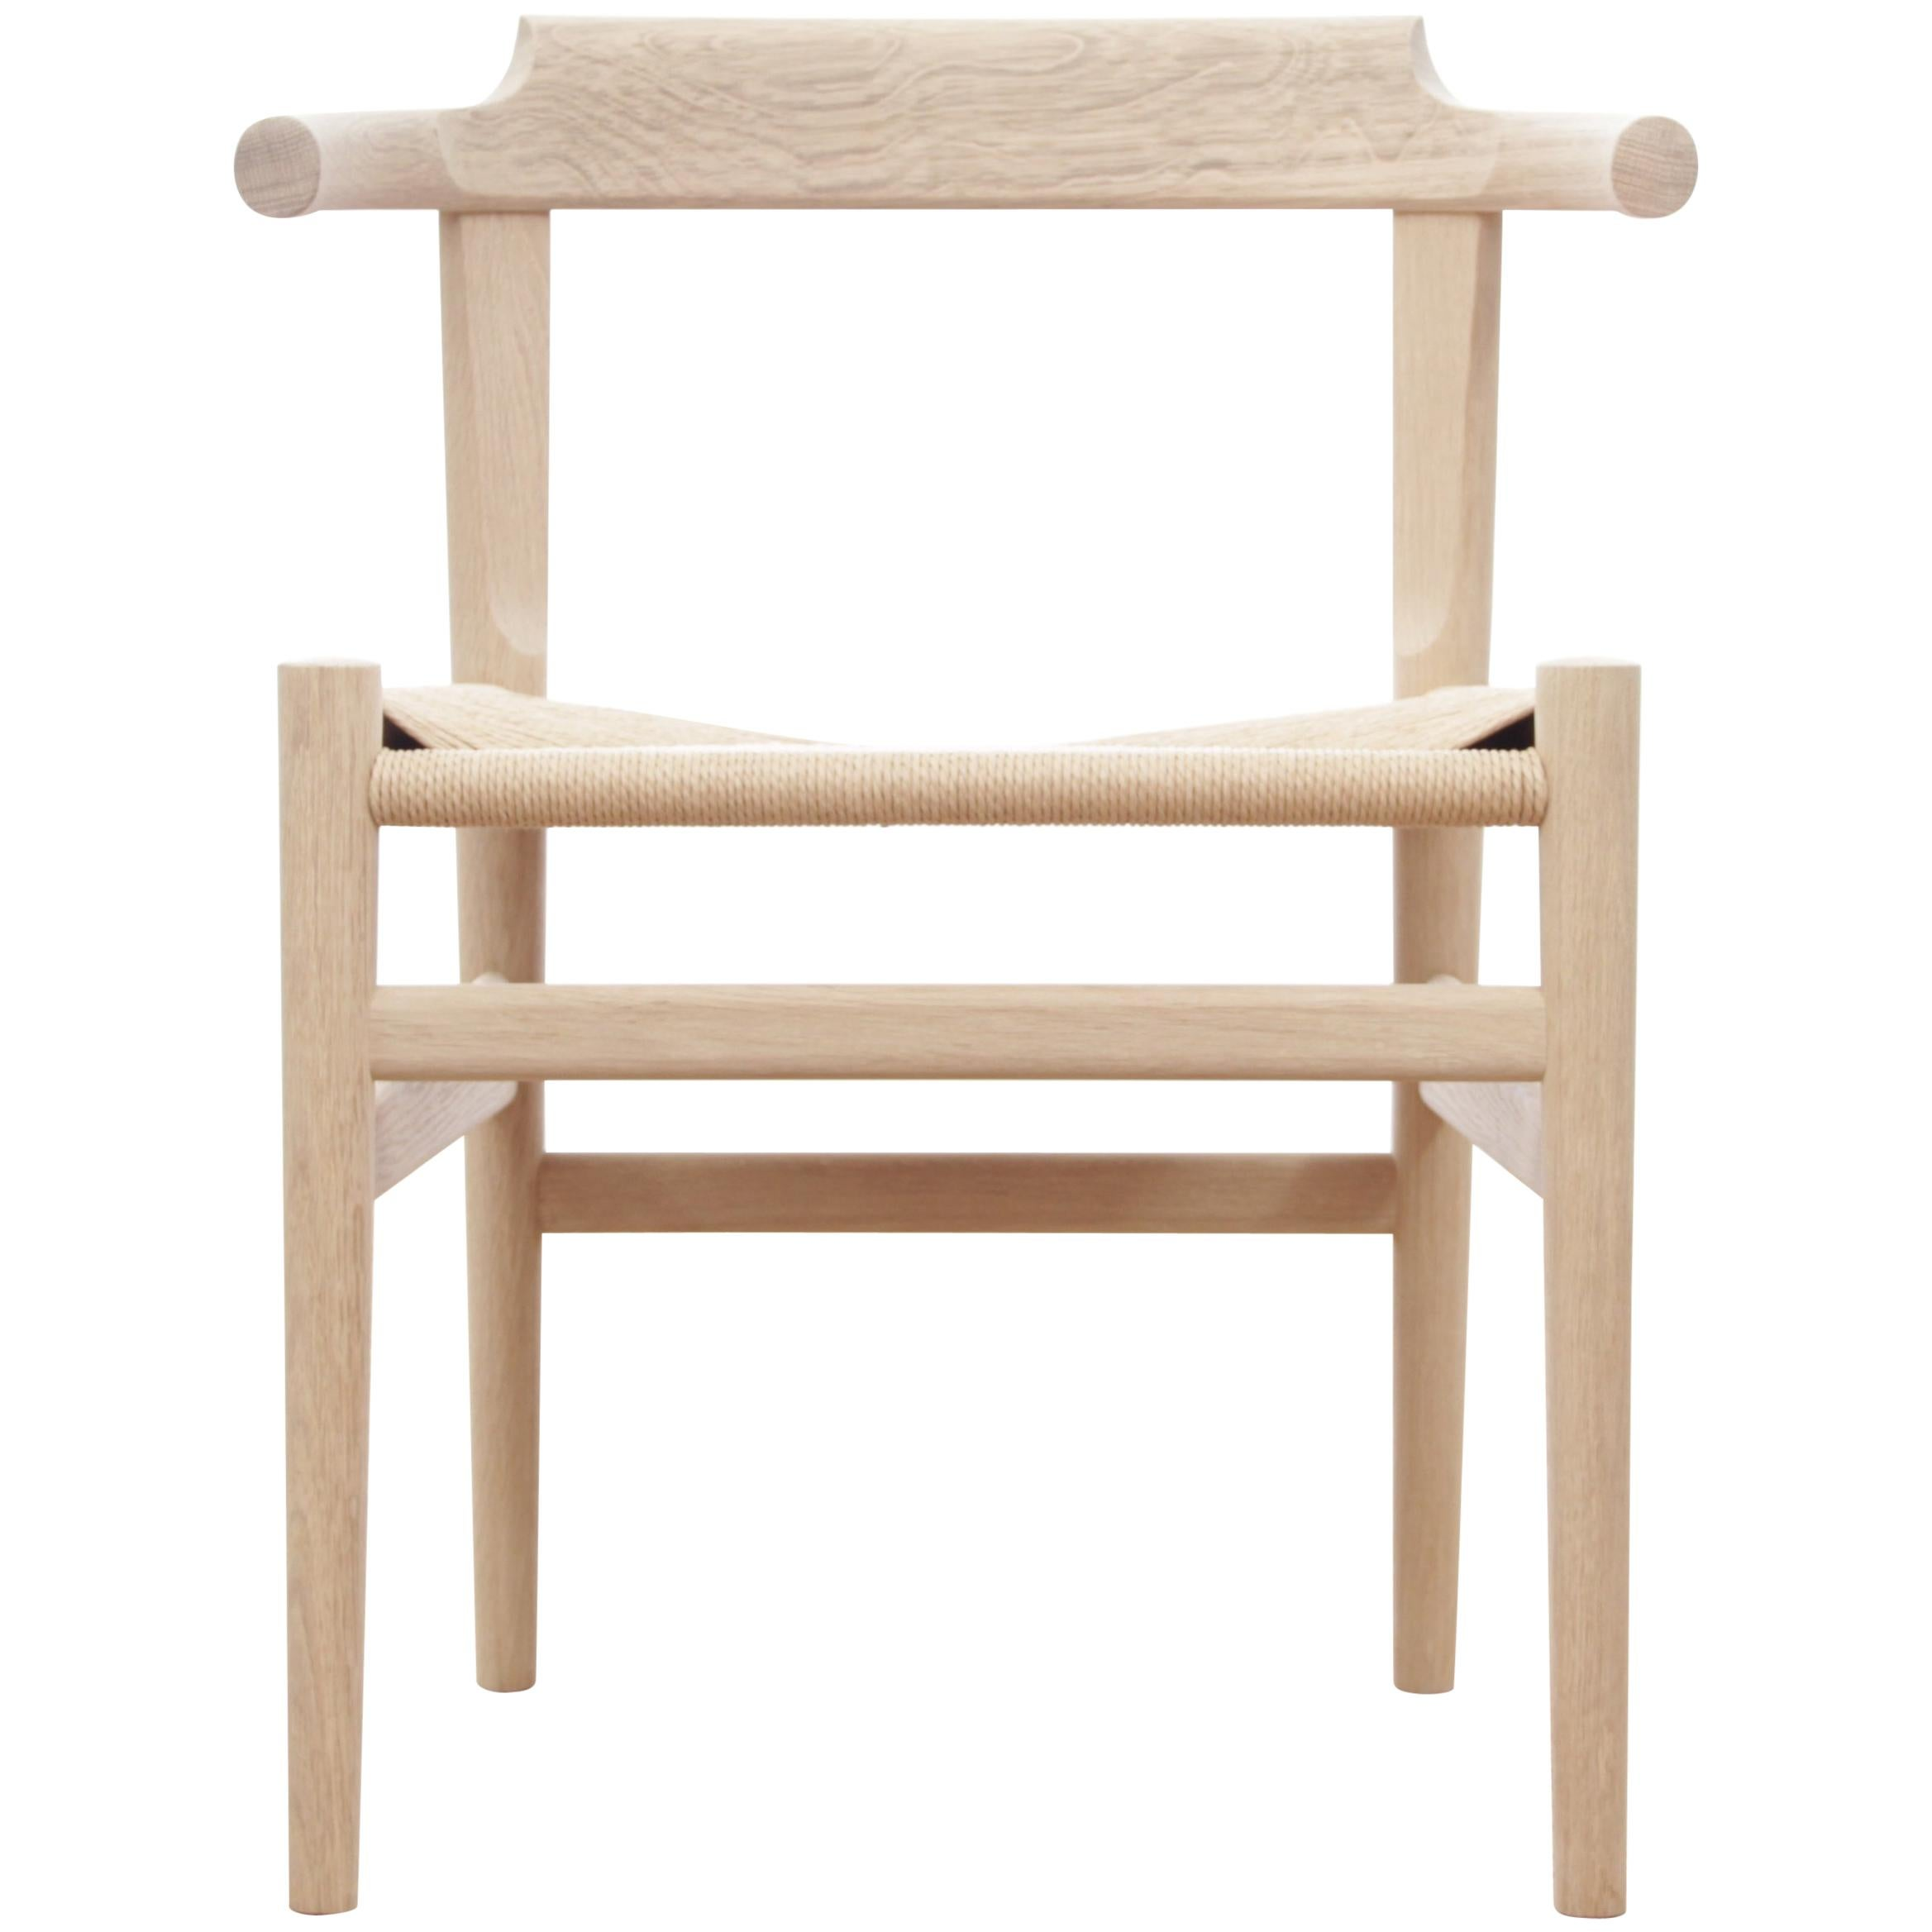 Mid-Century Modern Scandinavian Chair Model PP 68 by Hans Wegner